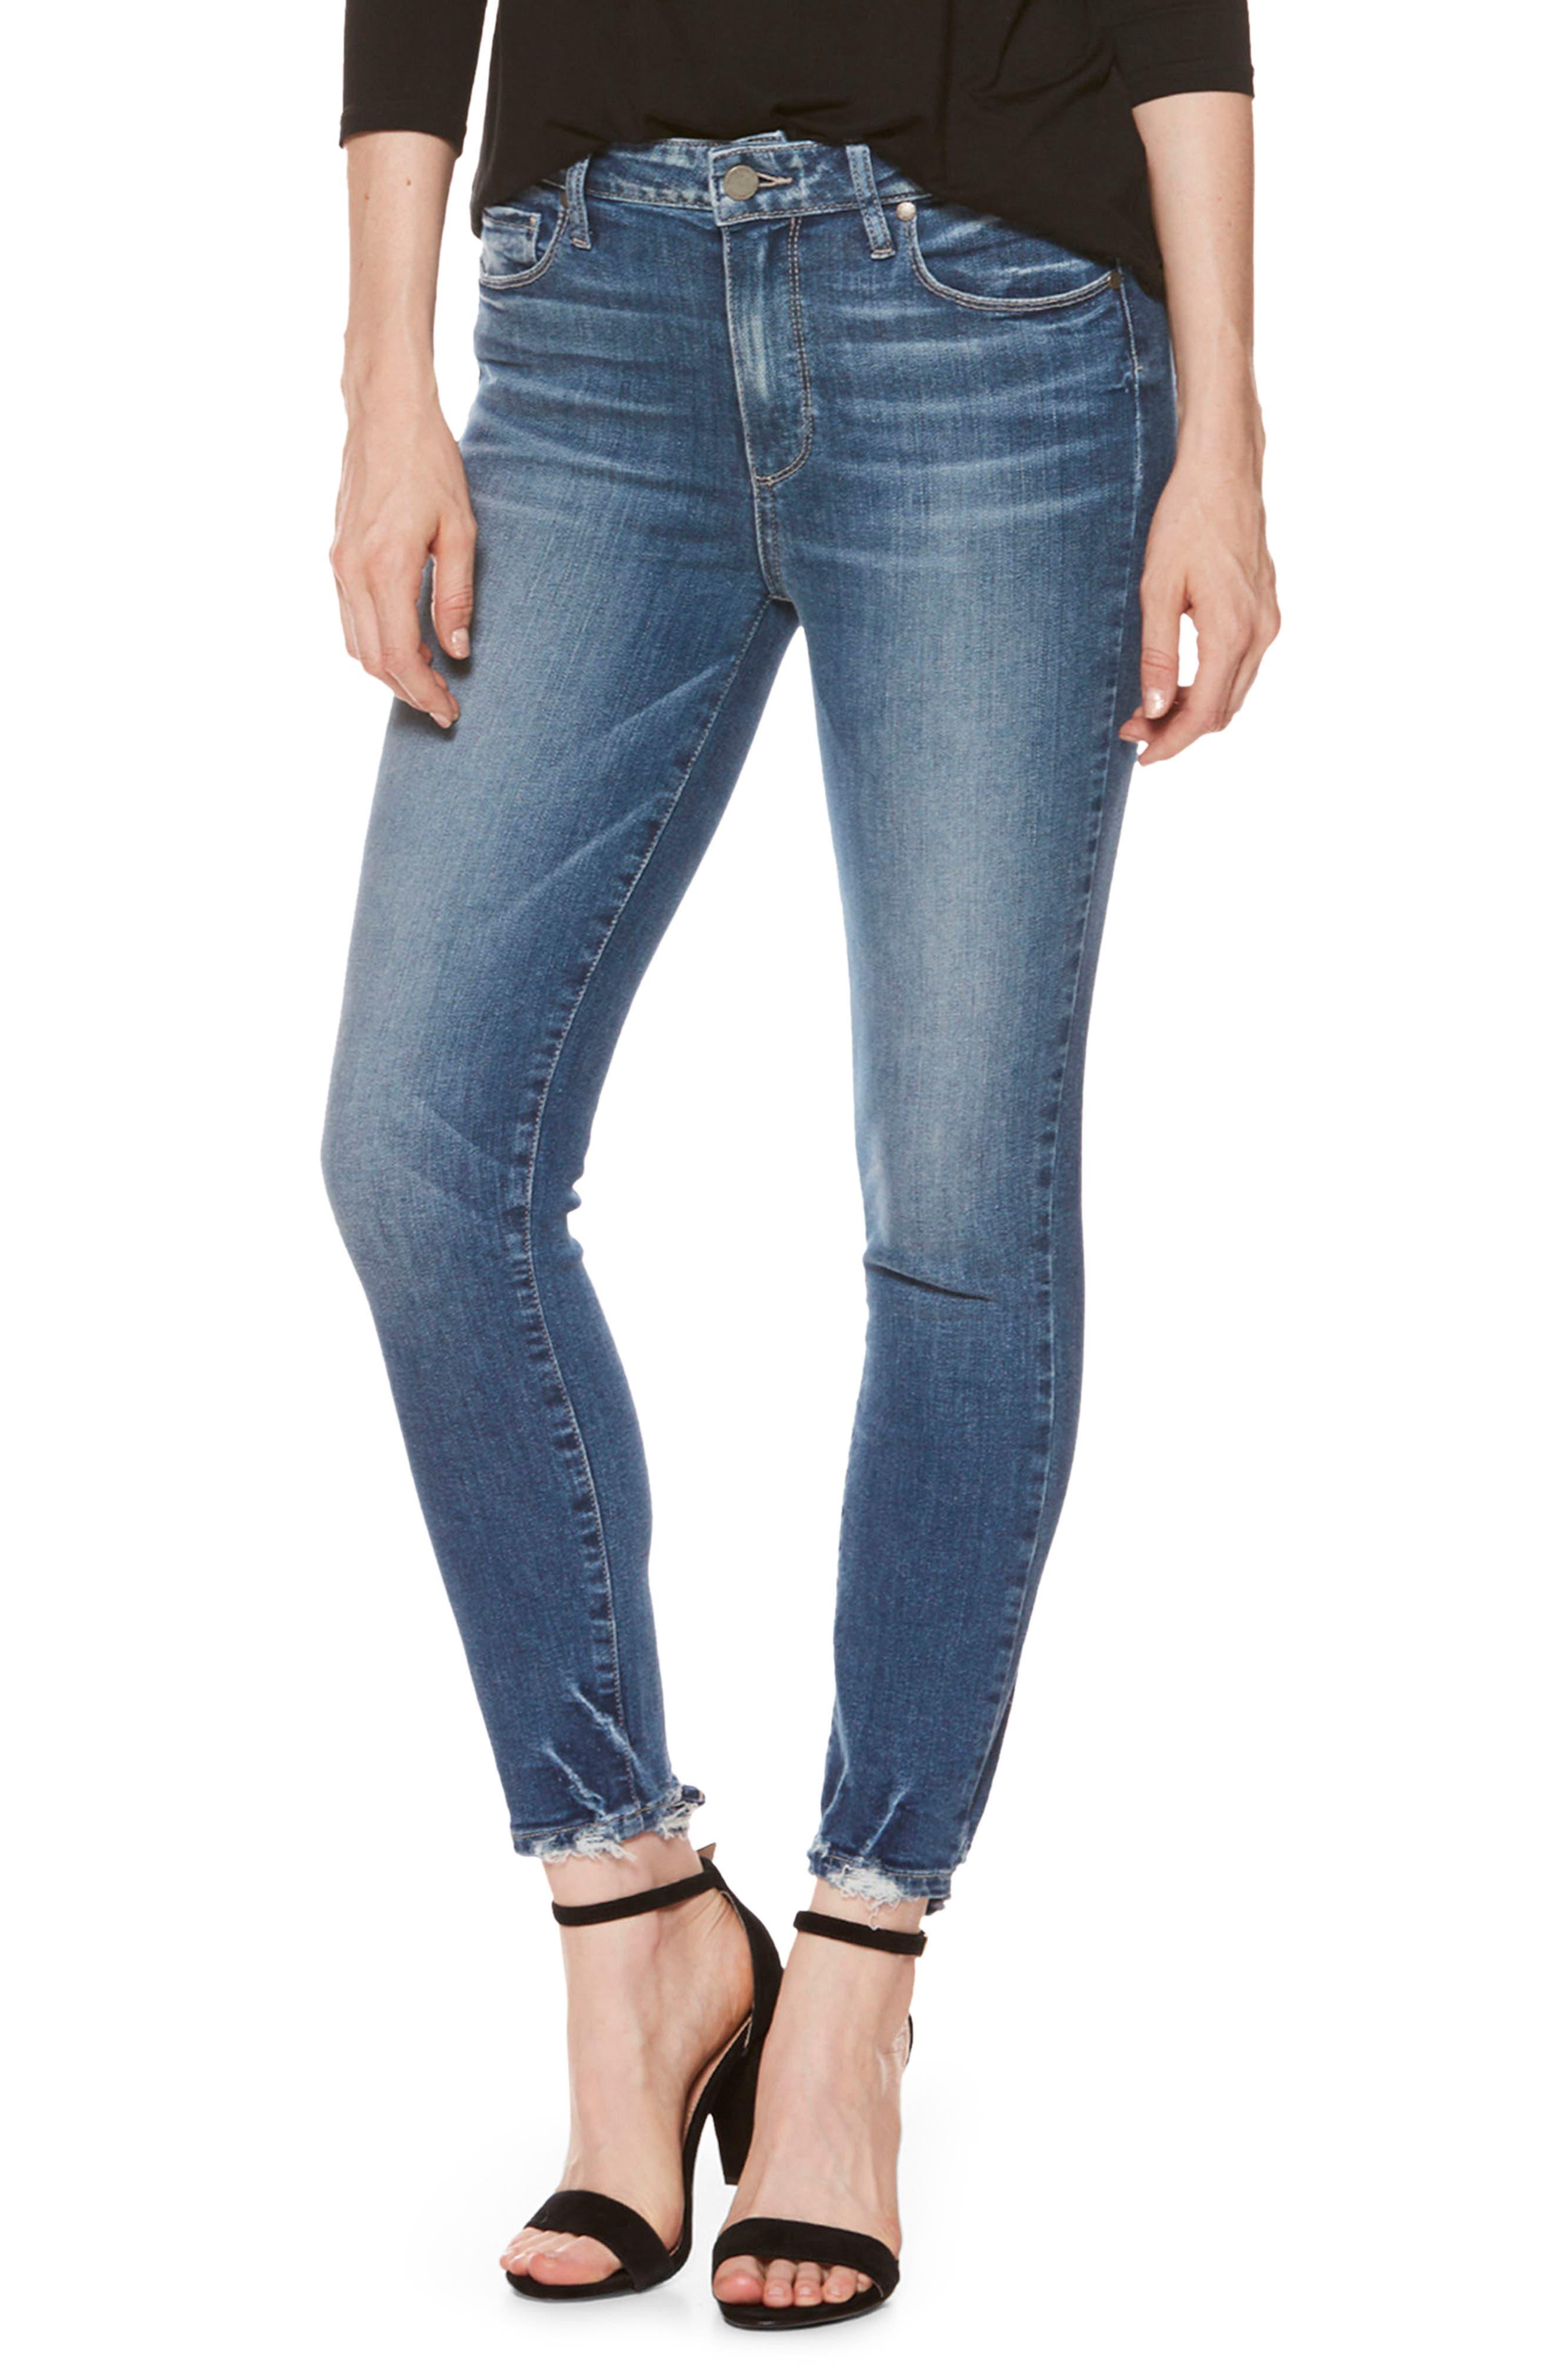 Hoxton High Waist Crop Skinny Jeans,                         Main,                         color, Addler Blue